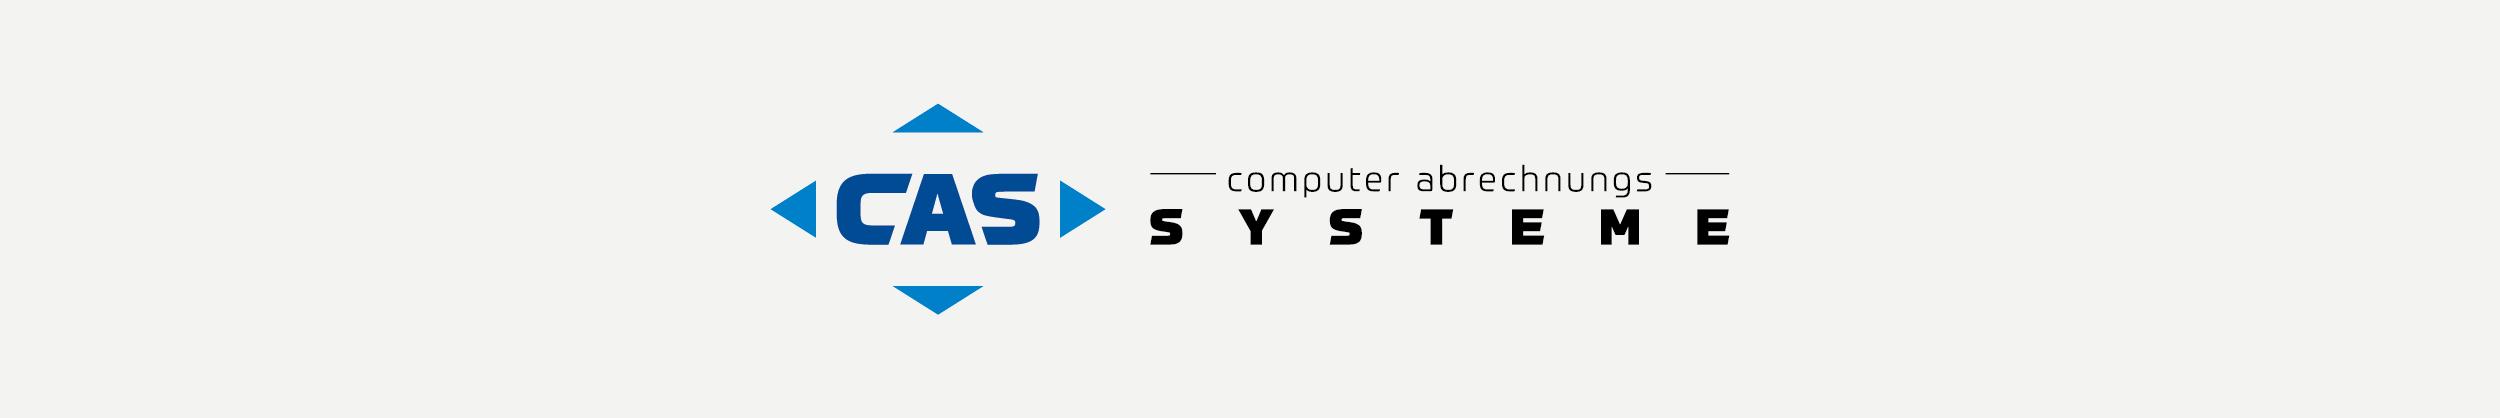 CAS Computer-Abrechnungs-Systeme GmbH LOGO